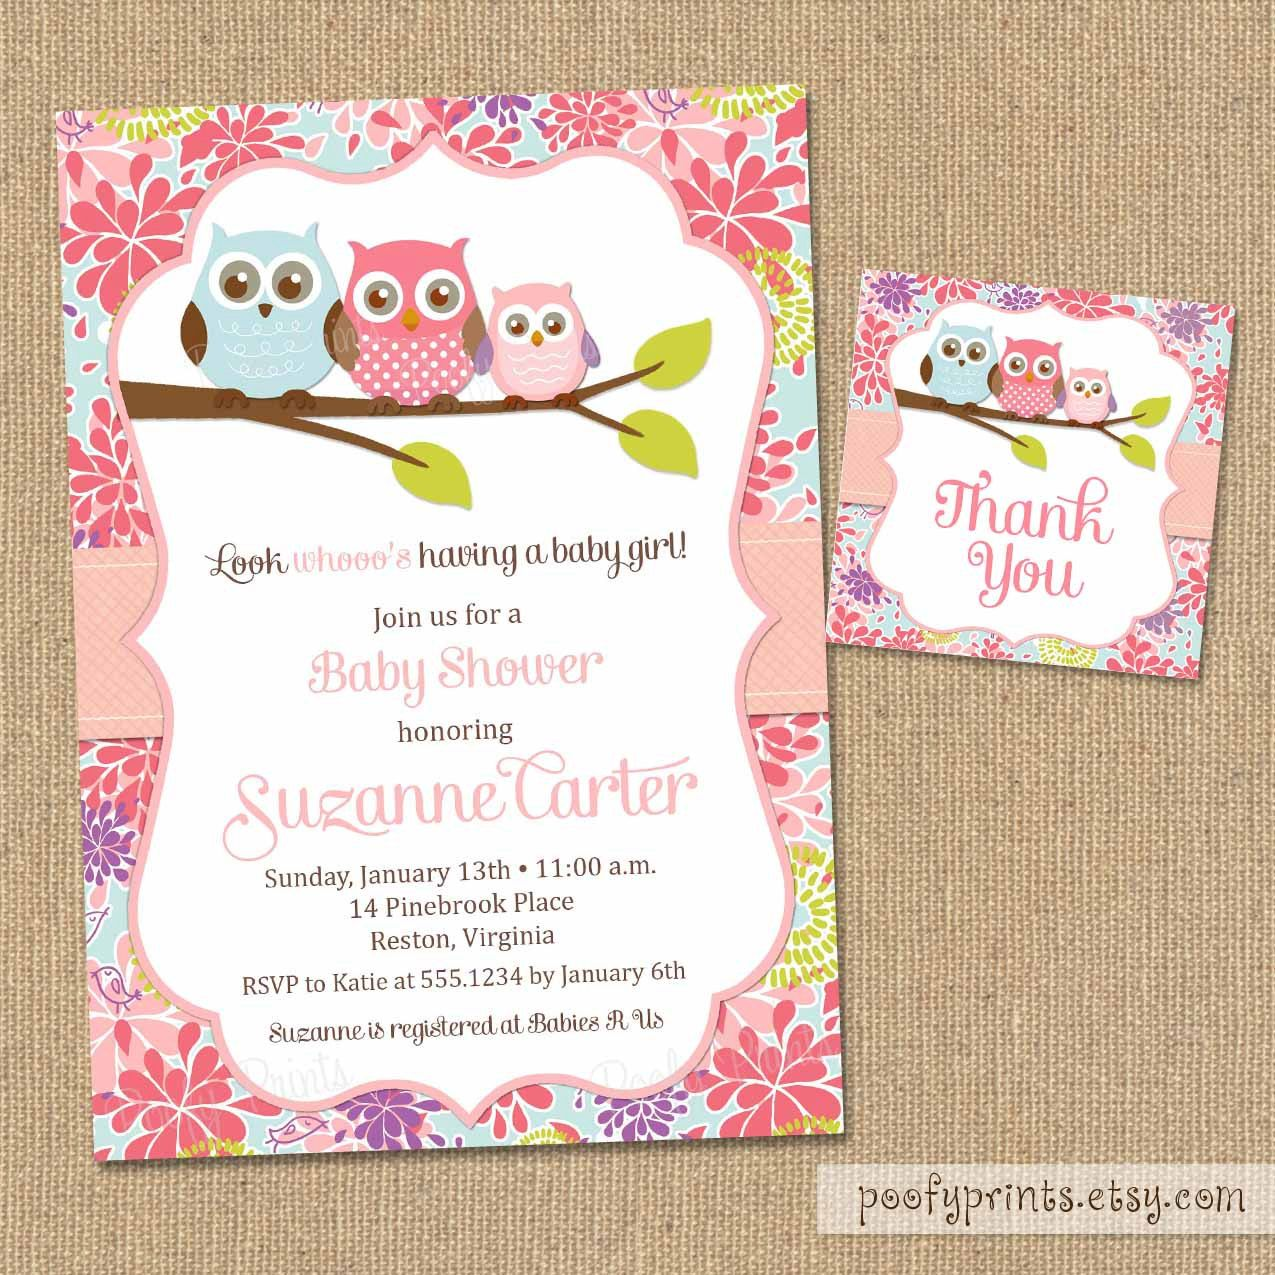 Owl Baby Shower Invitations Diy Printable Baby Girl Shower Invitati Baby Shower Invites For Girl Owl Baby Shower Invitations Diy Baby Shower Invitations Girl